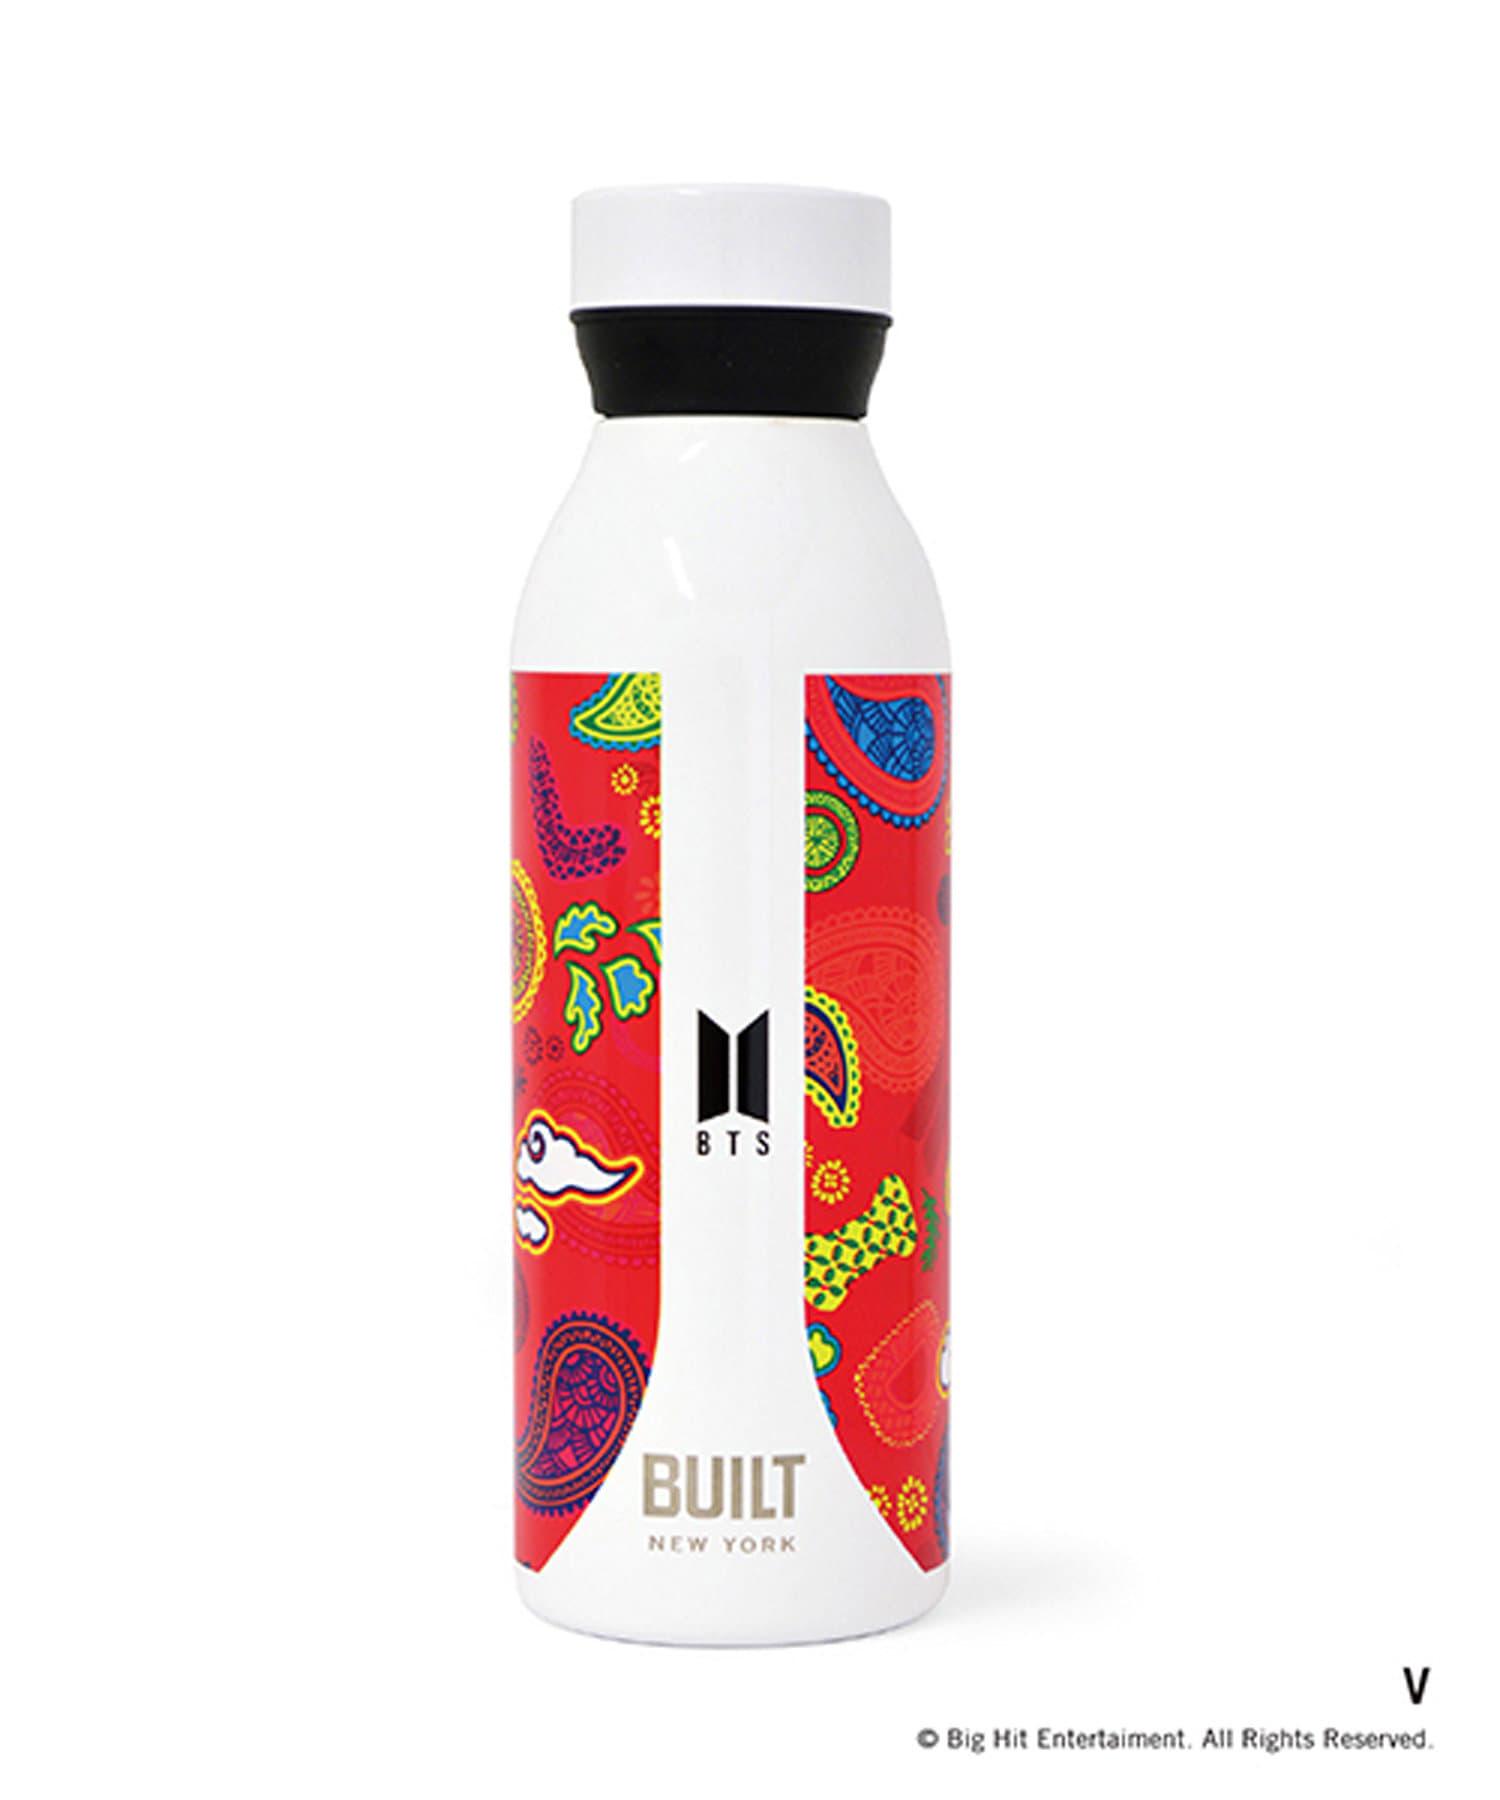 CIAOPANIC TYPY(チャオパニックティピー) ライフスタイル 【BTS×BUILT】 ボトル (V) 532ml【パルクロ限定】 レッド